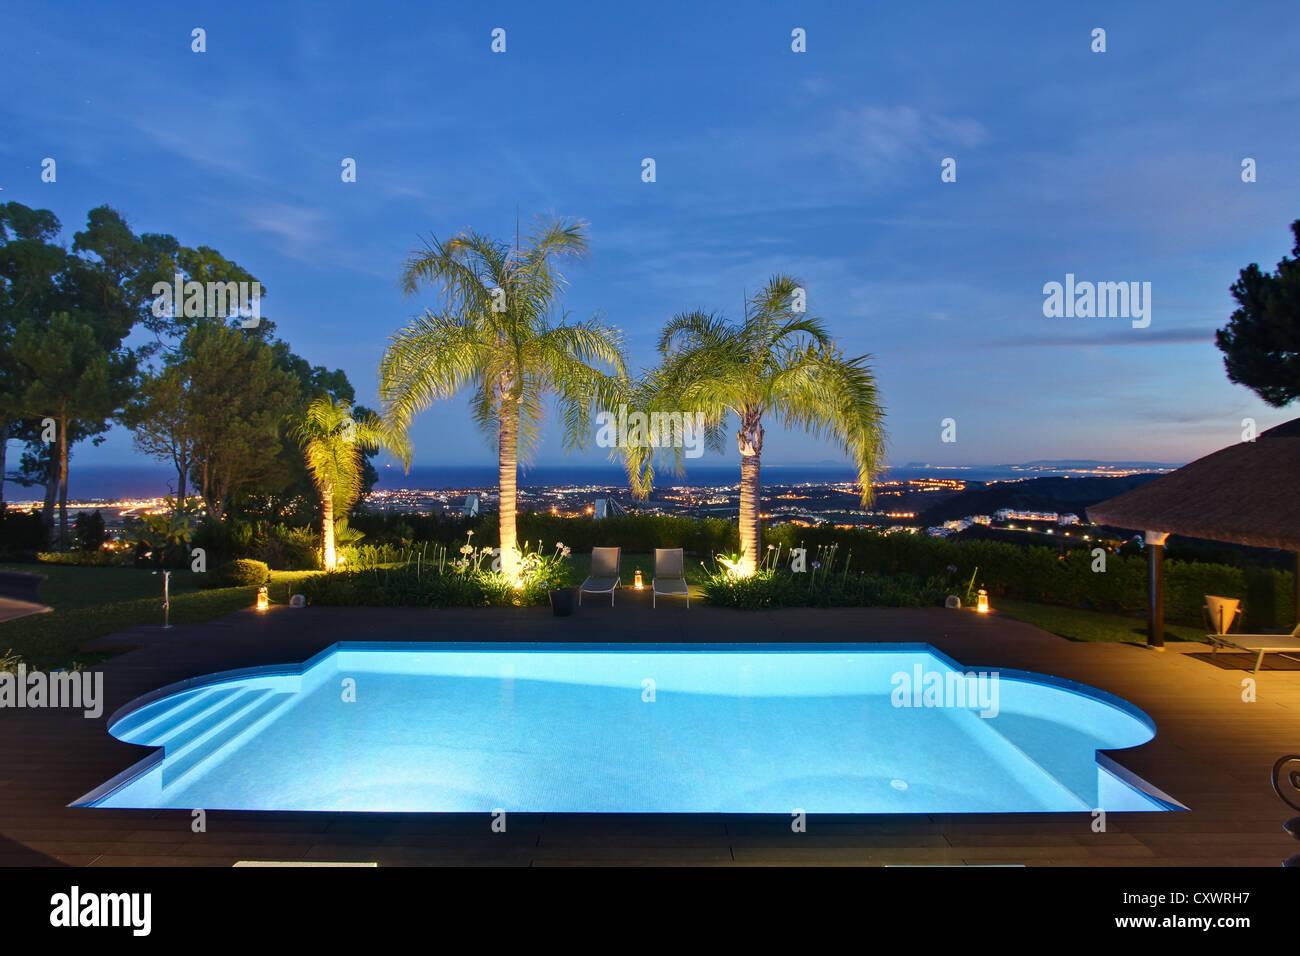 Illuminated pool and palm trees - Stock Image